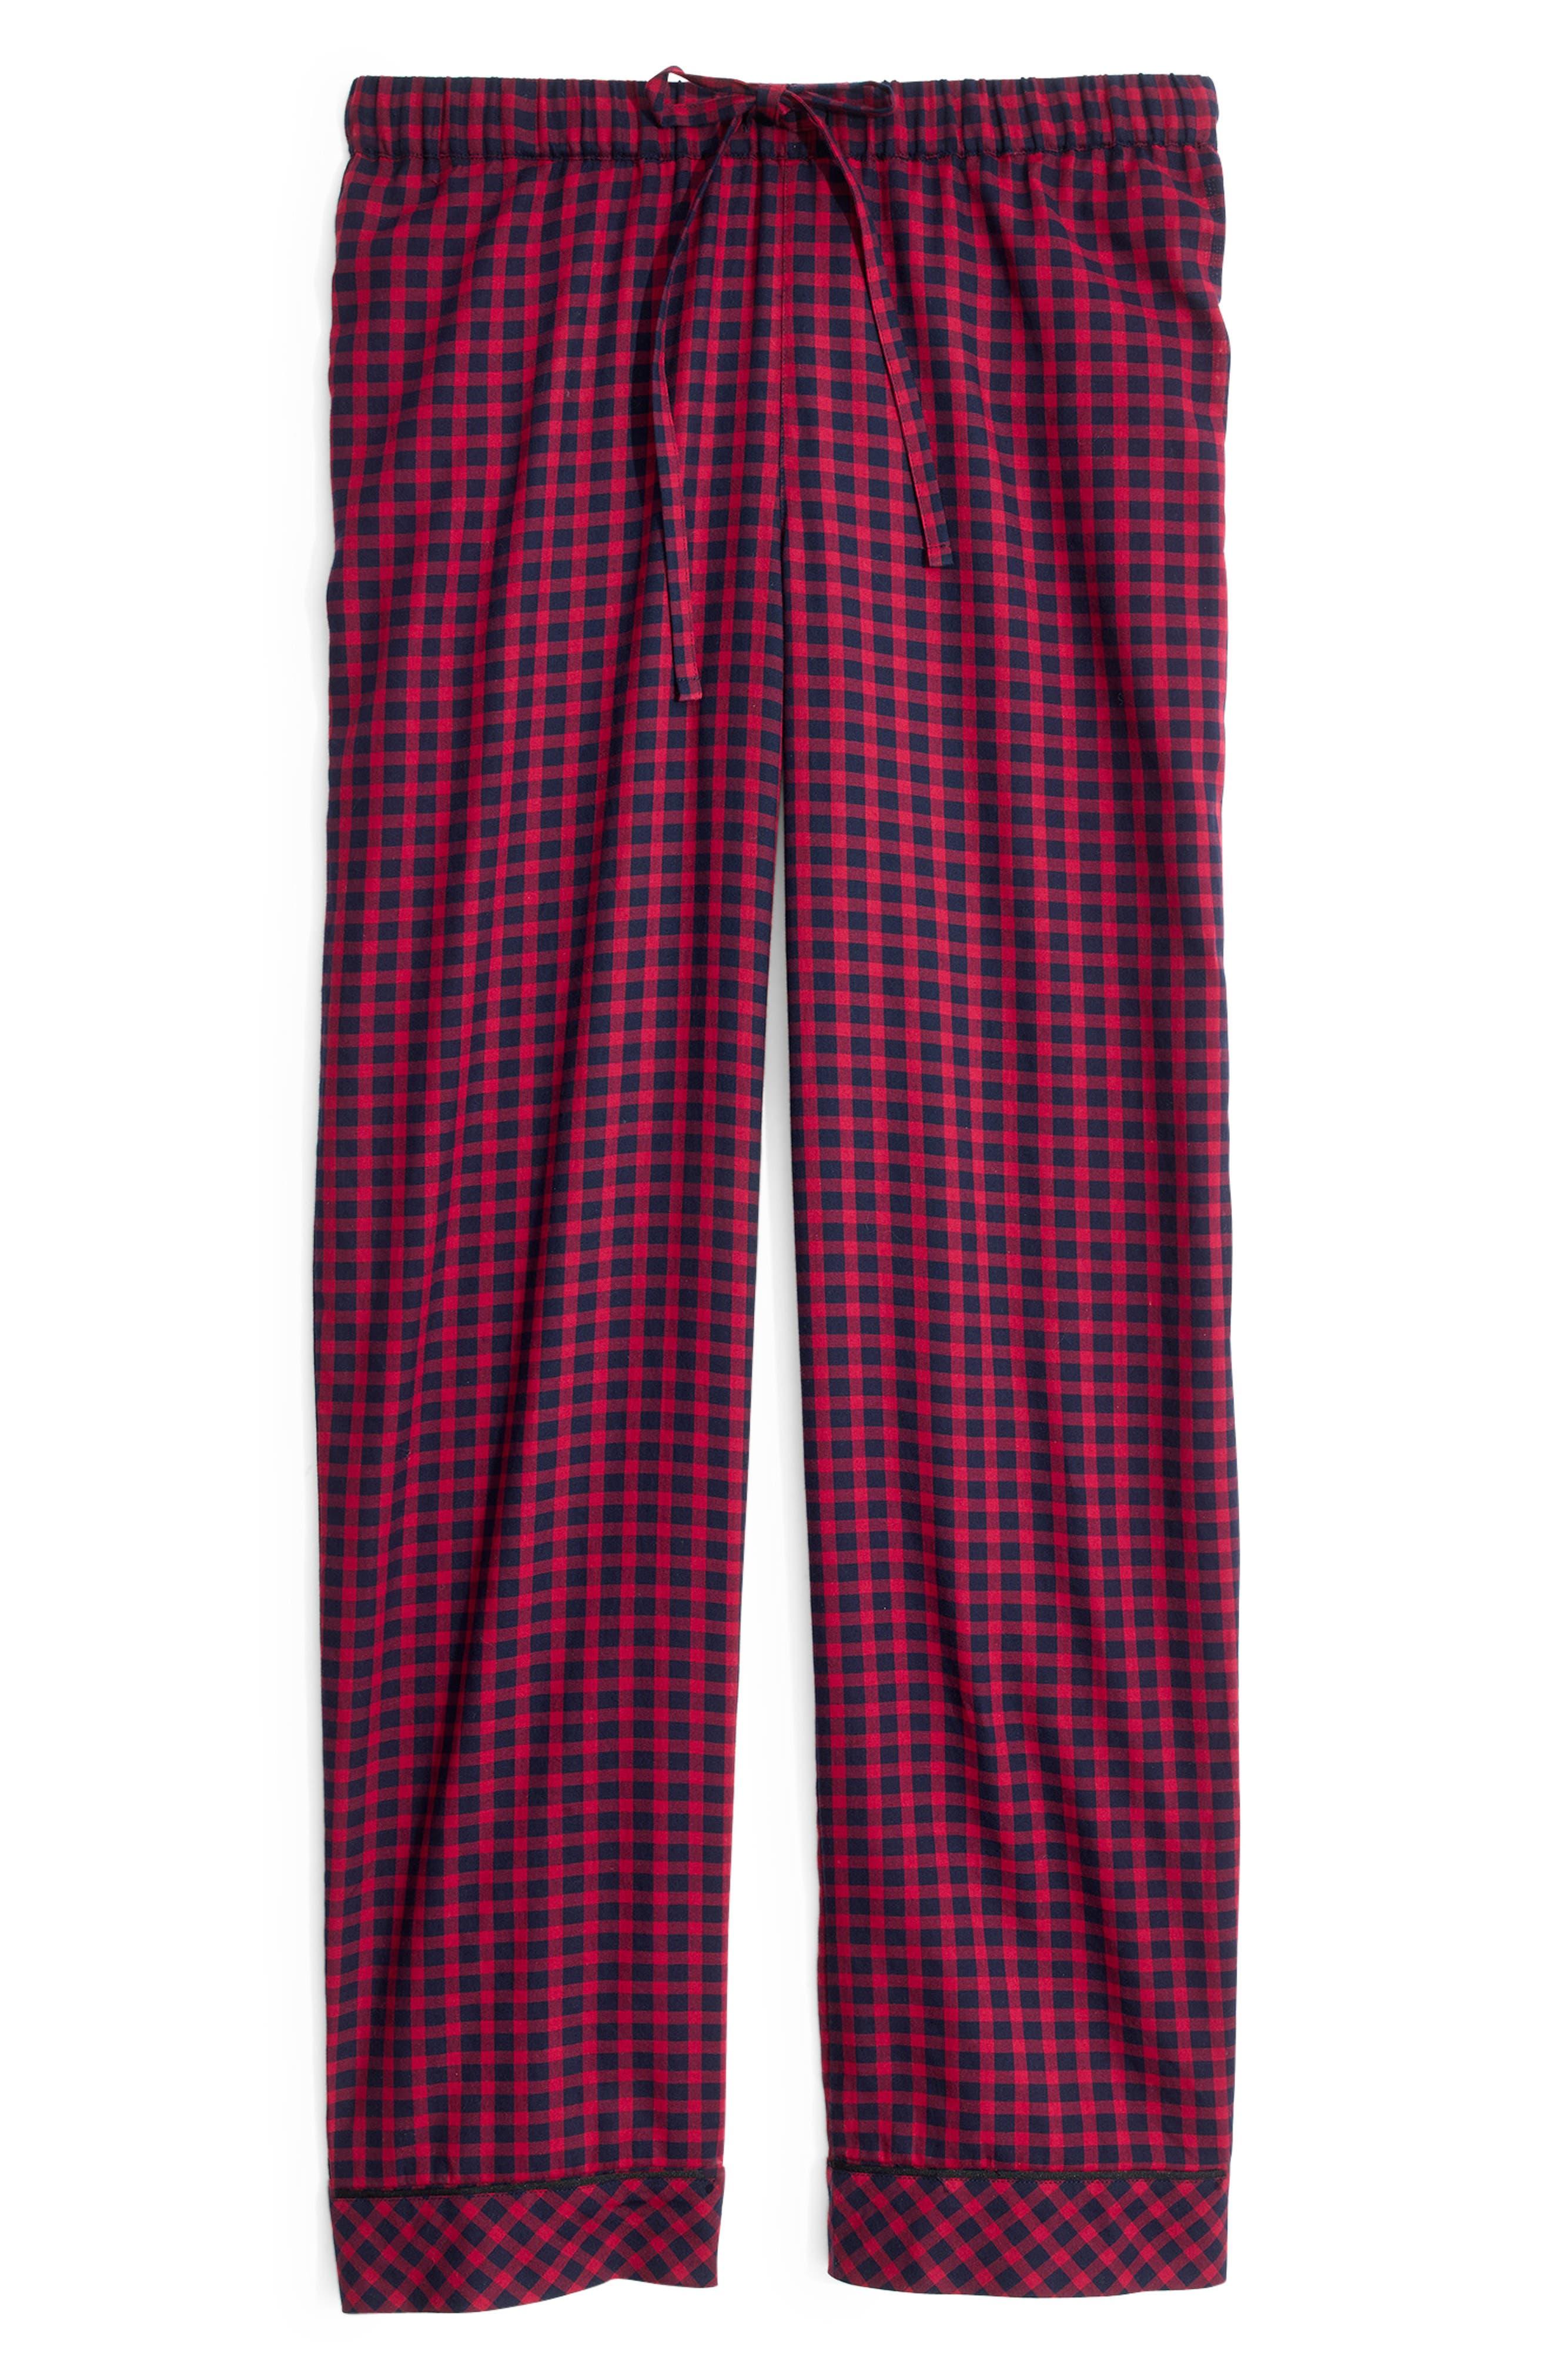 Bedtime Pajama Pants,                             Alternate thumbnail 4, color,                             CRANBERRY